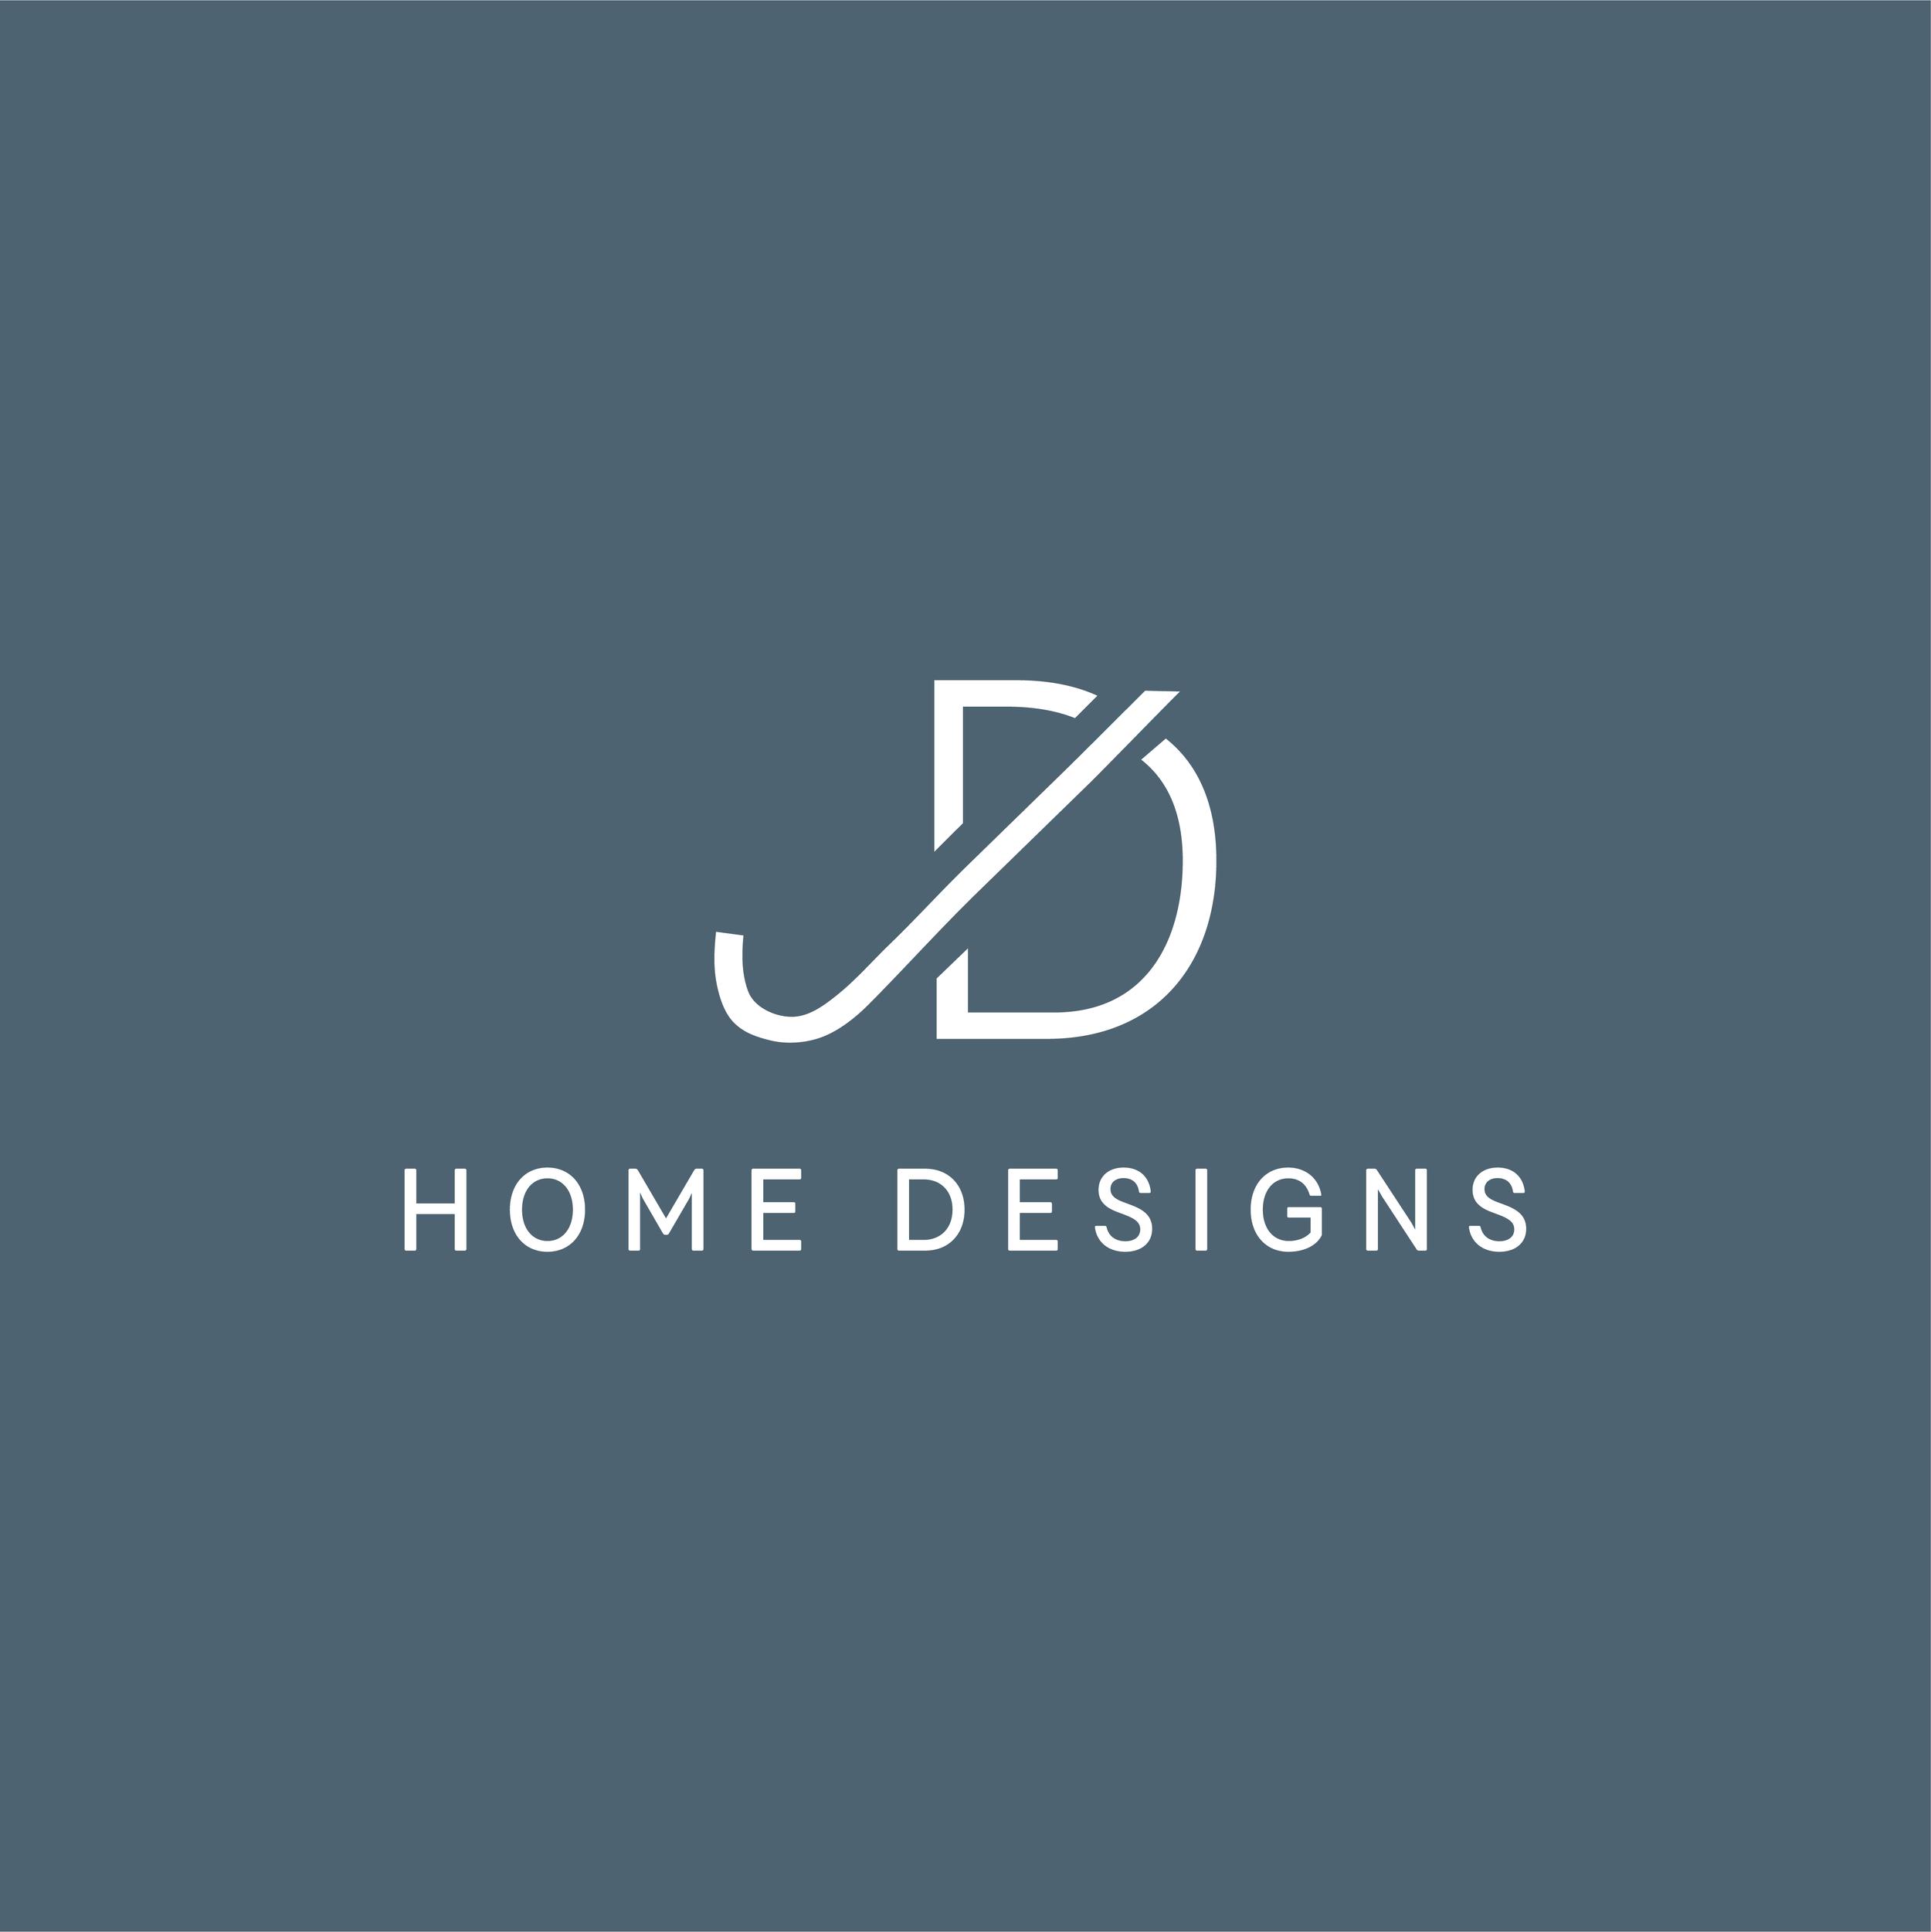 JD Home Designs Social-02.png